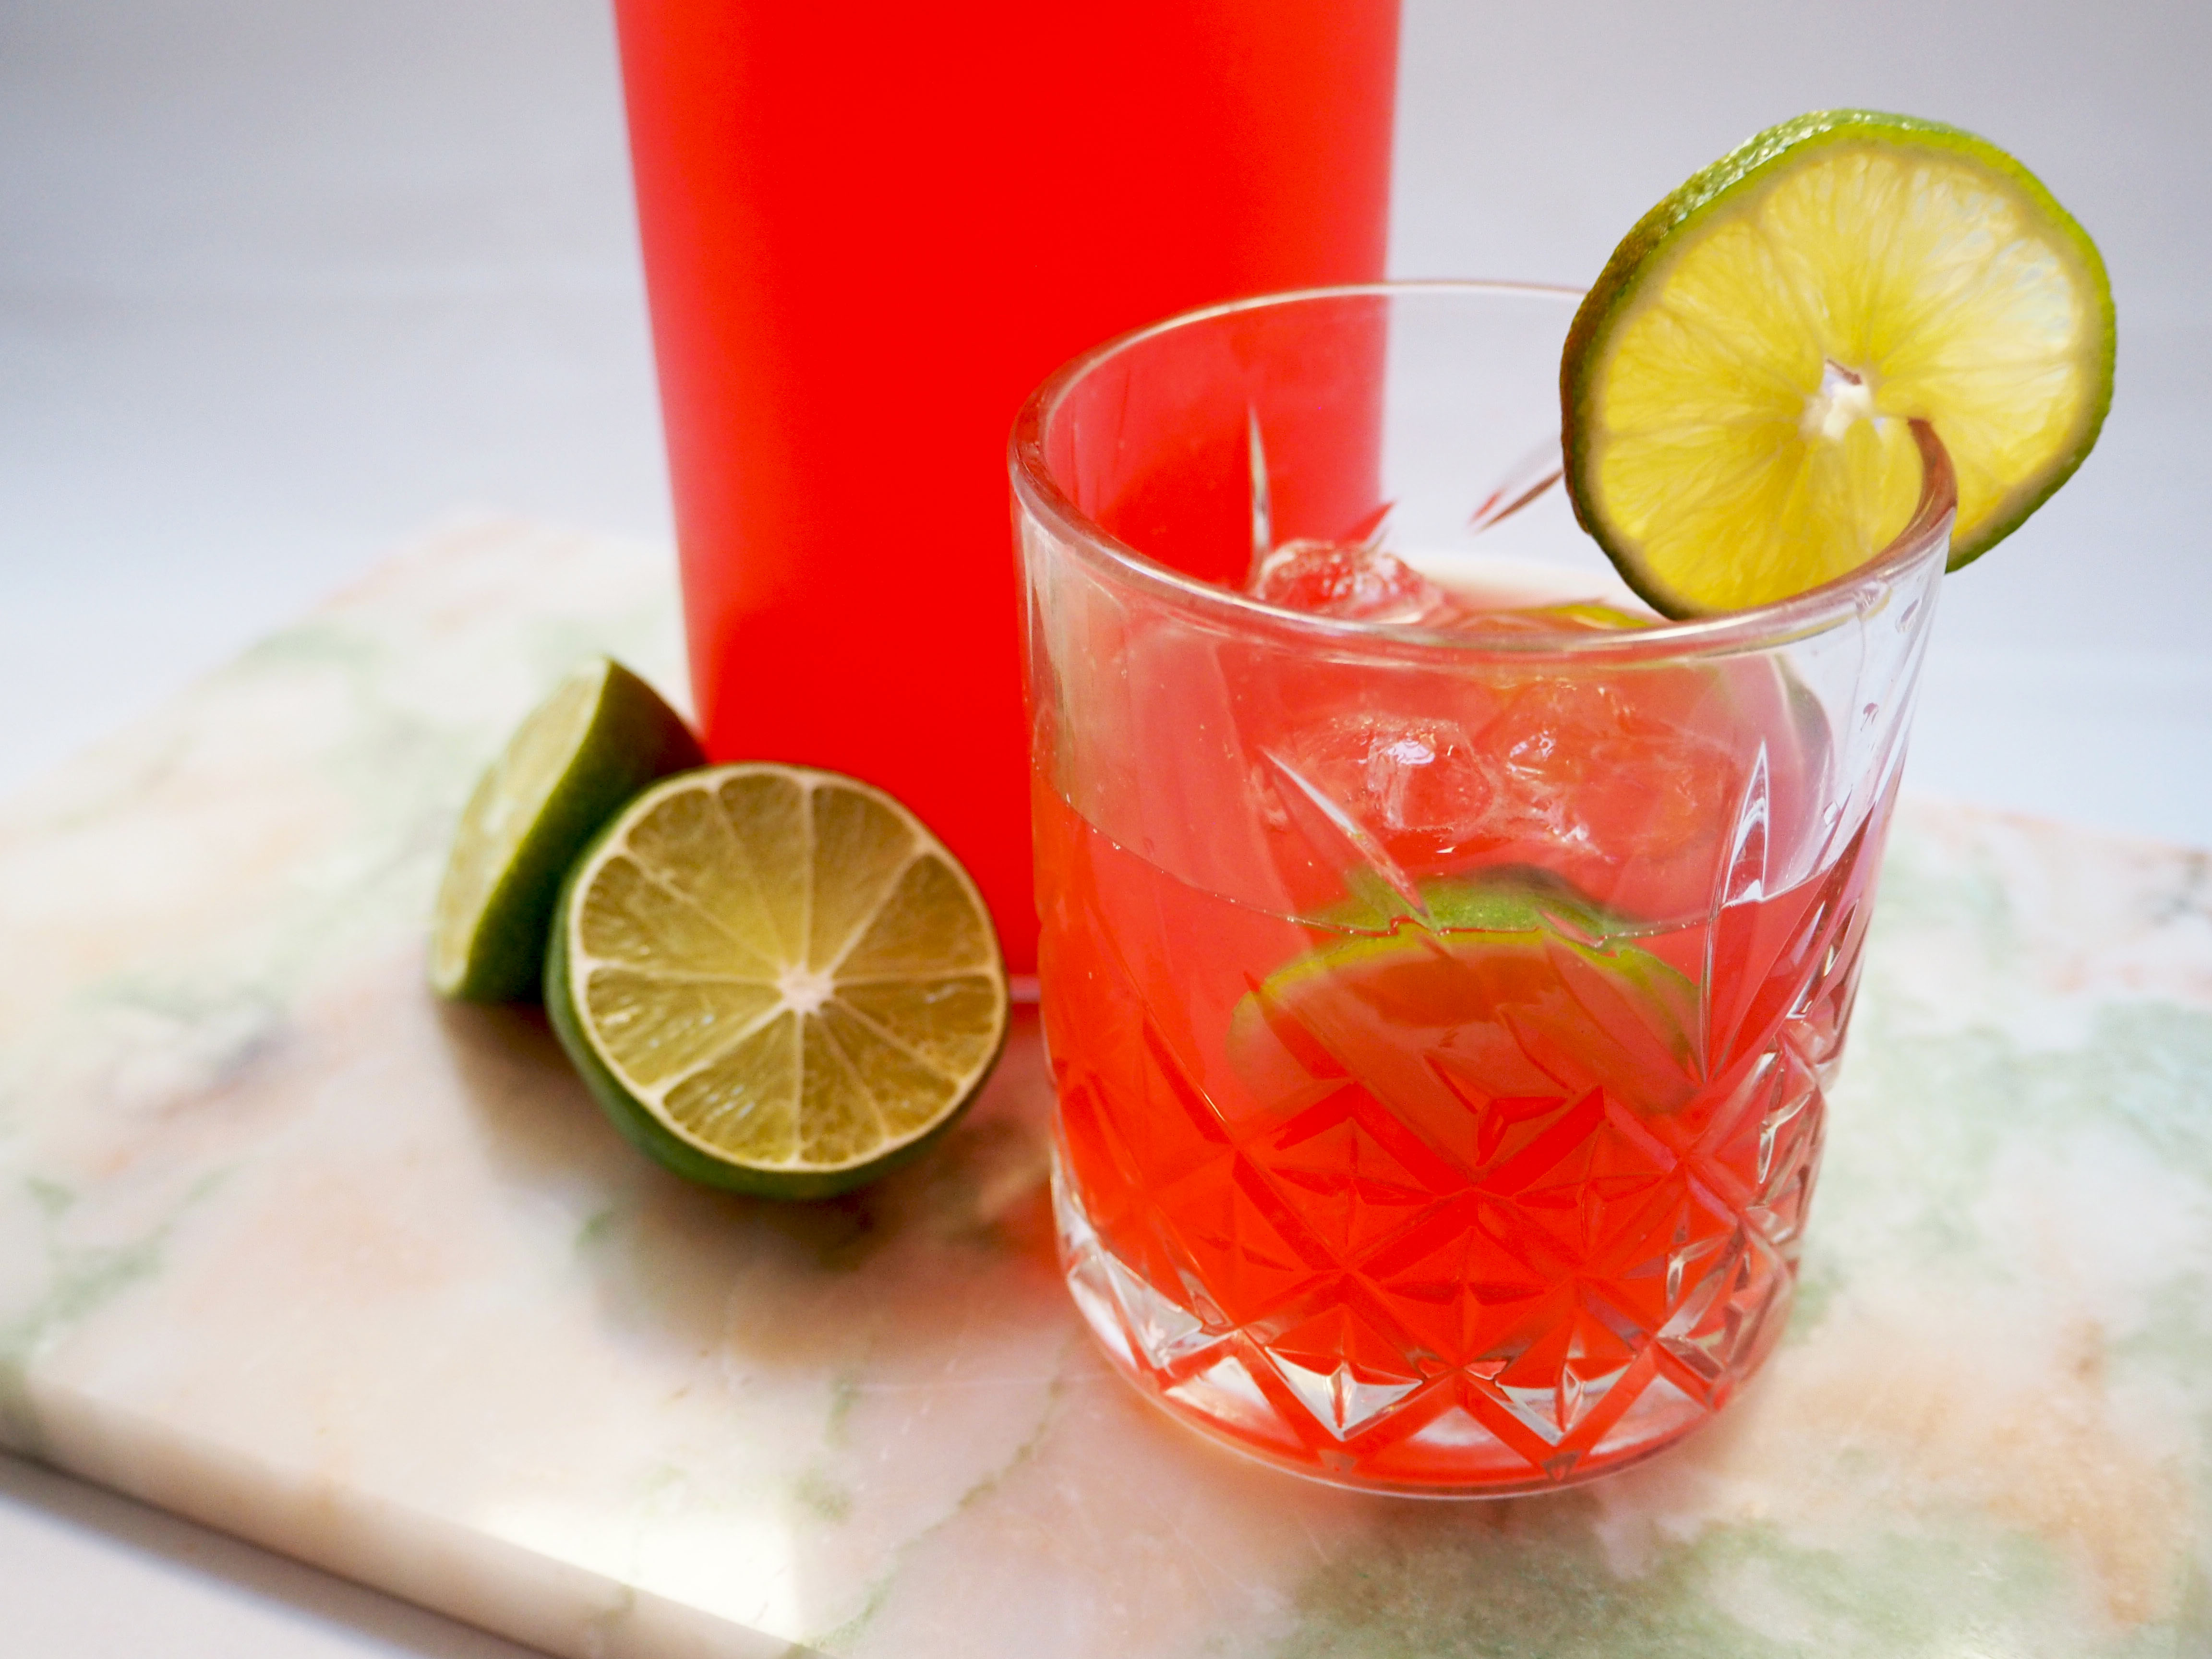 kuukskes rabarber limonade met limoen